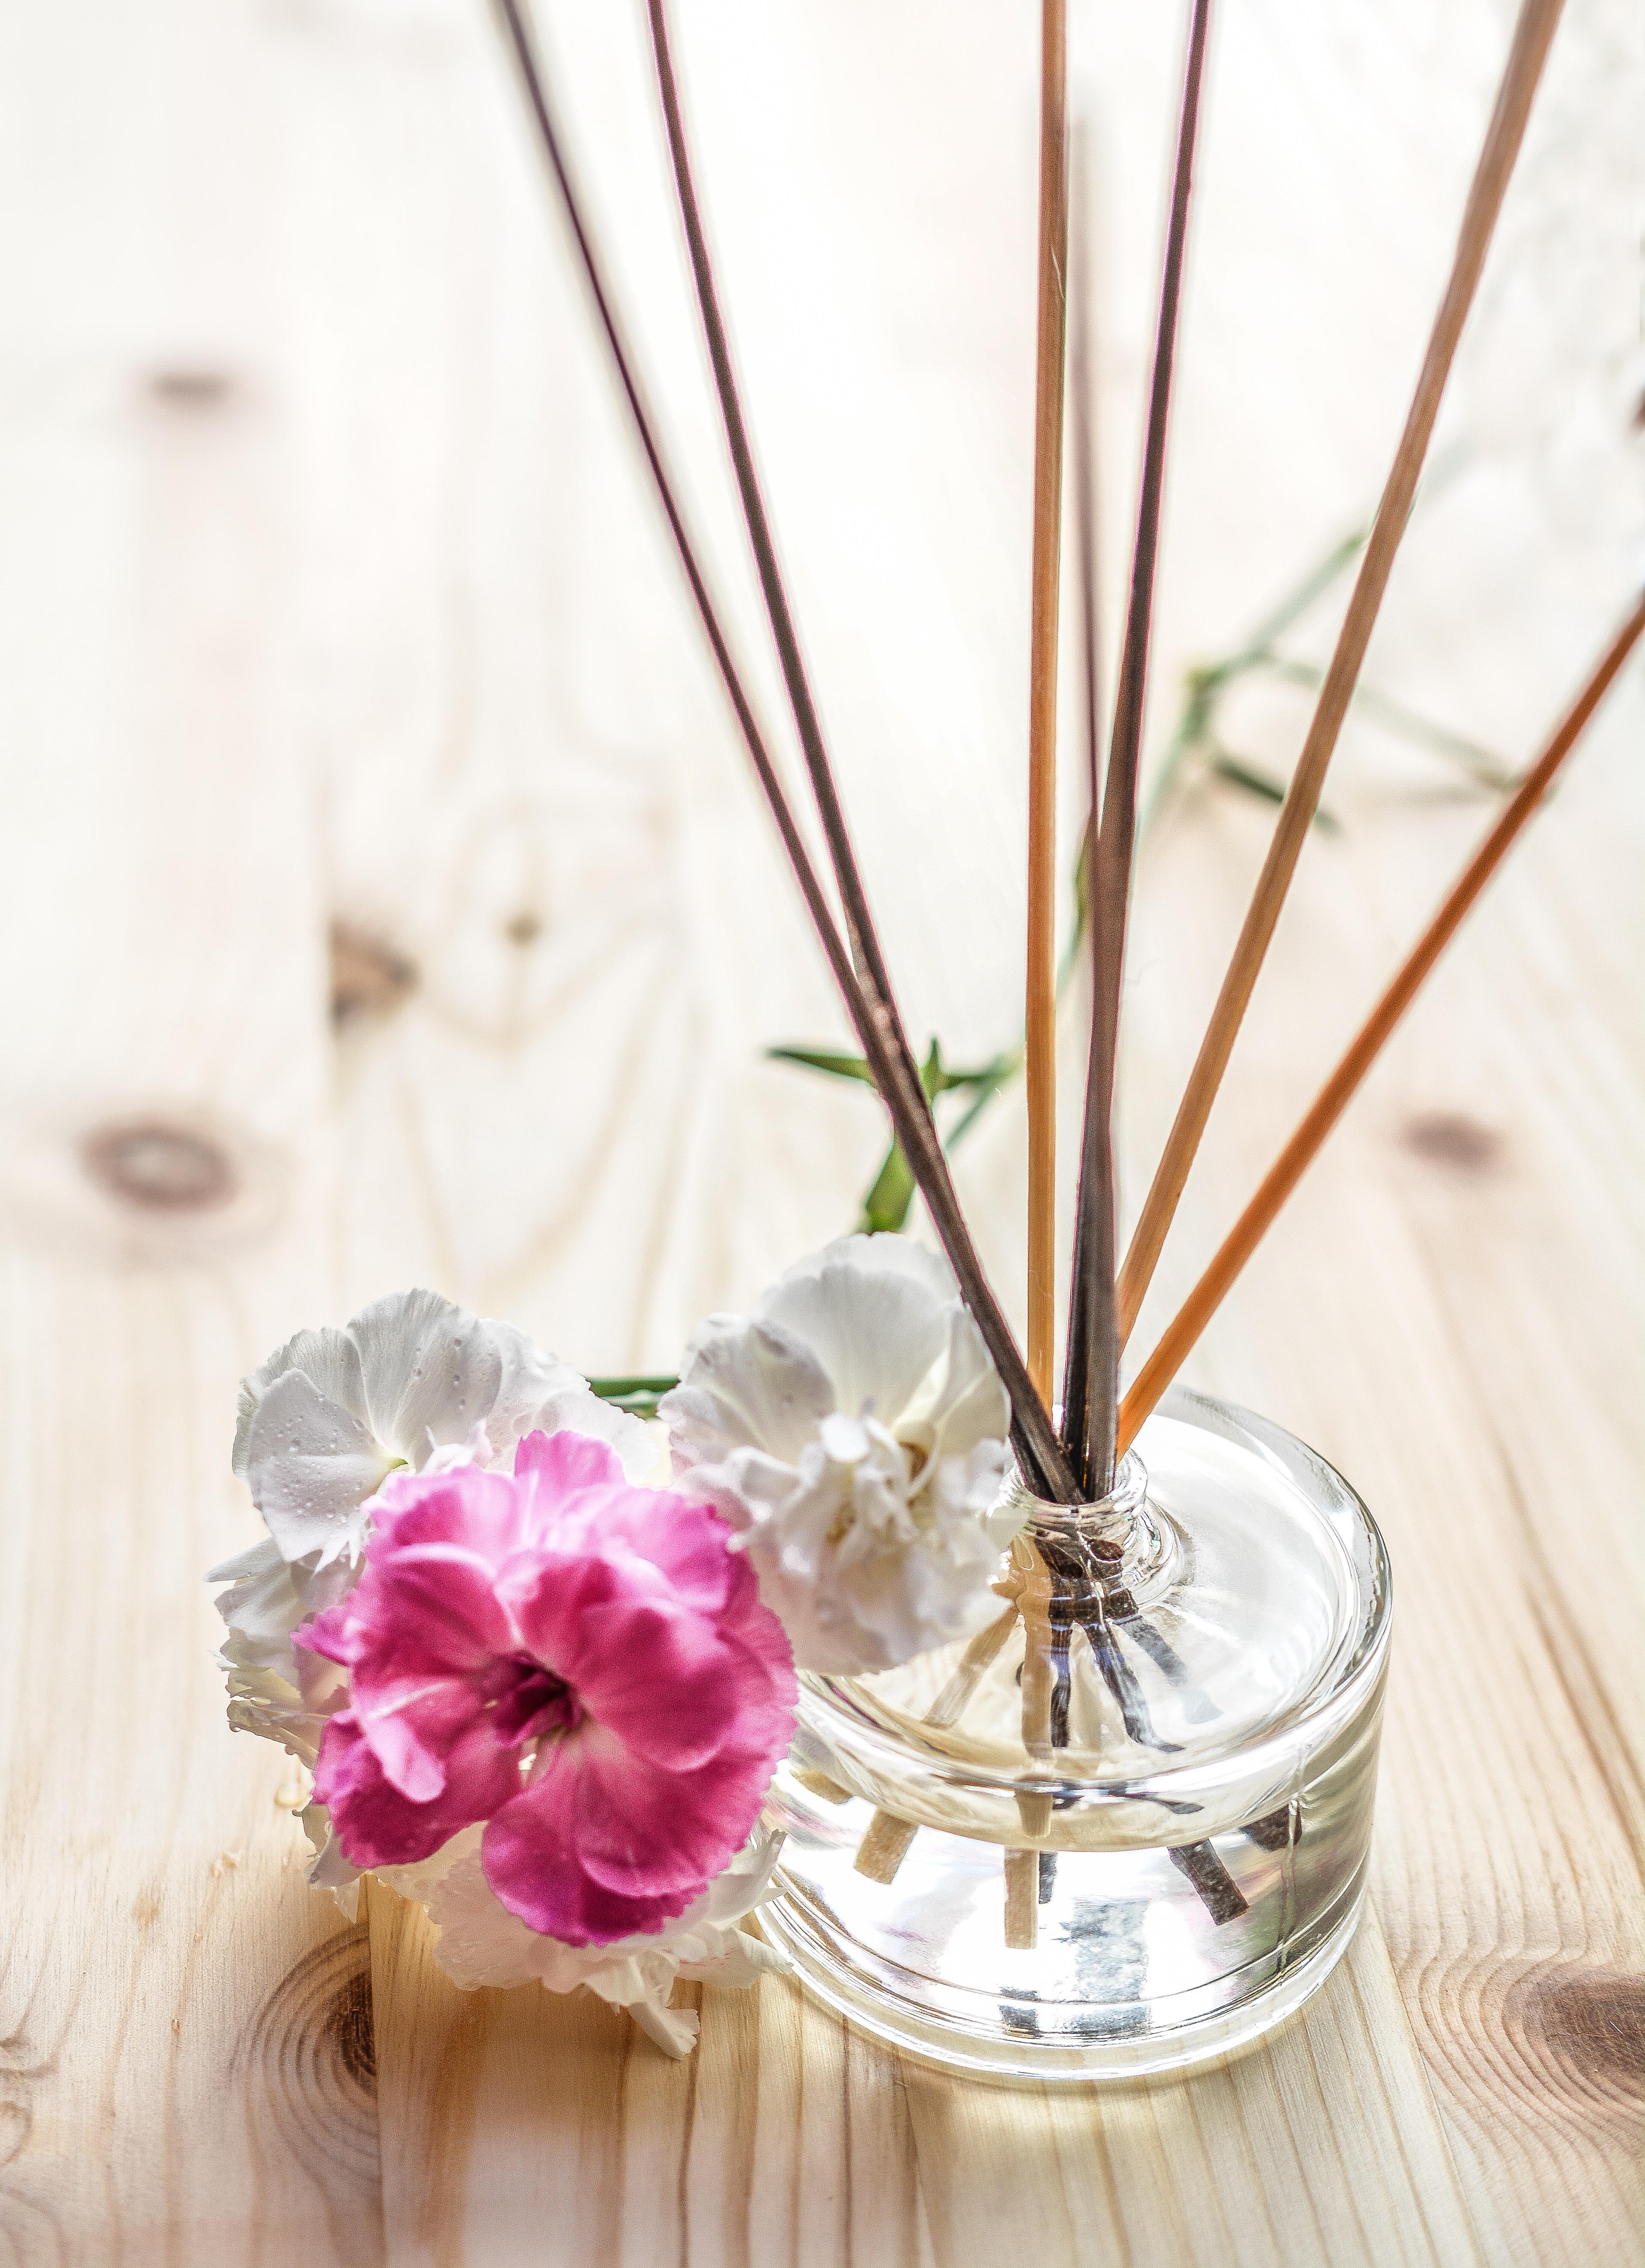 Glass Pottery & Glass Glass Vase Fragrant Aroma